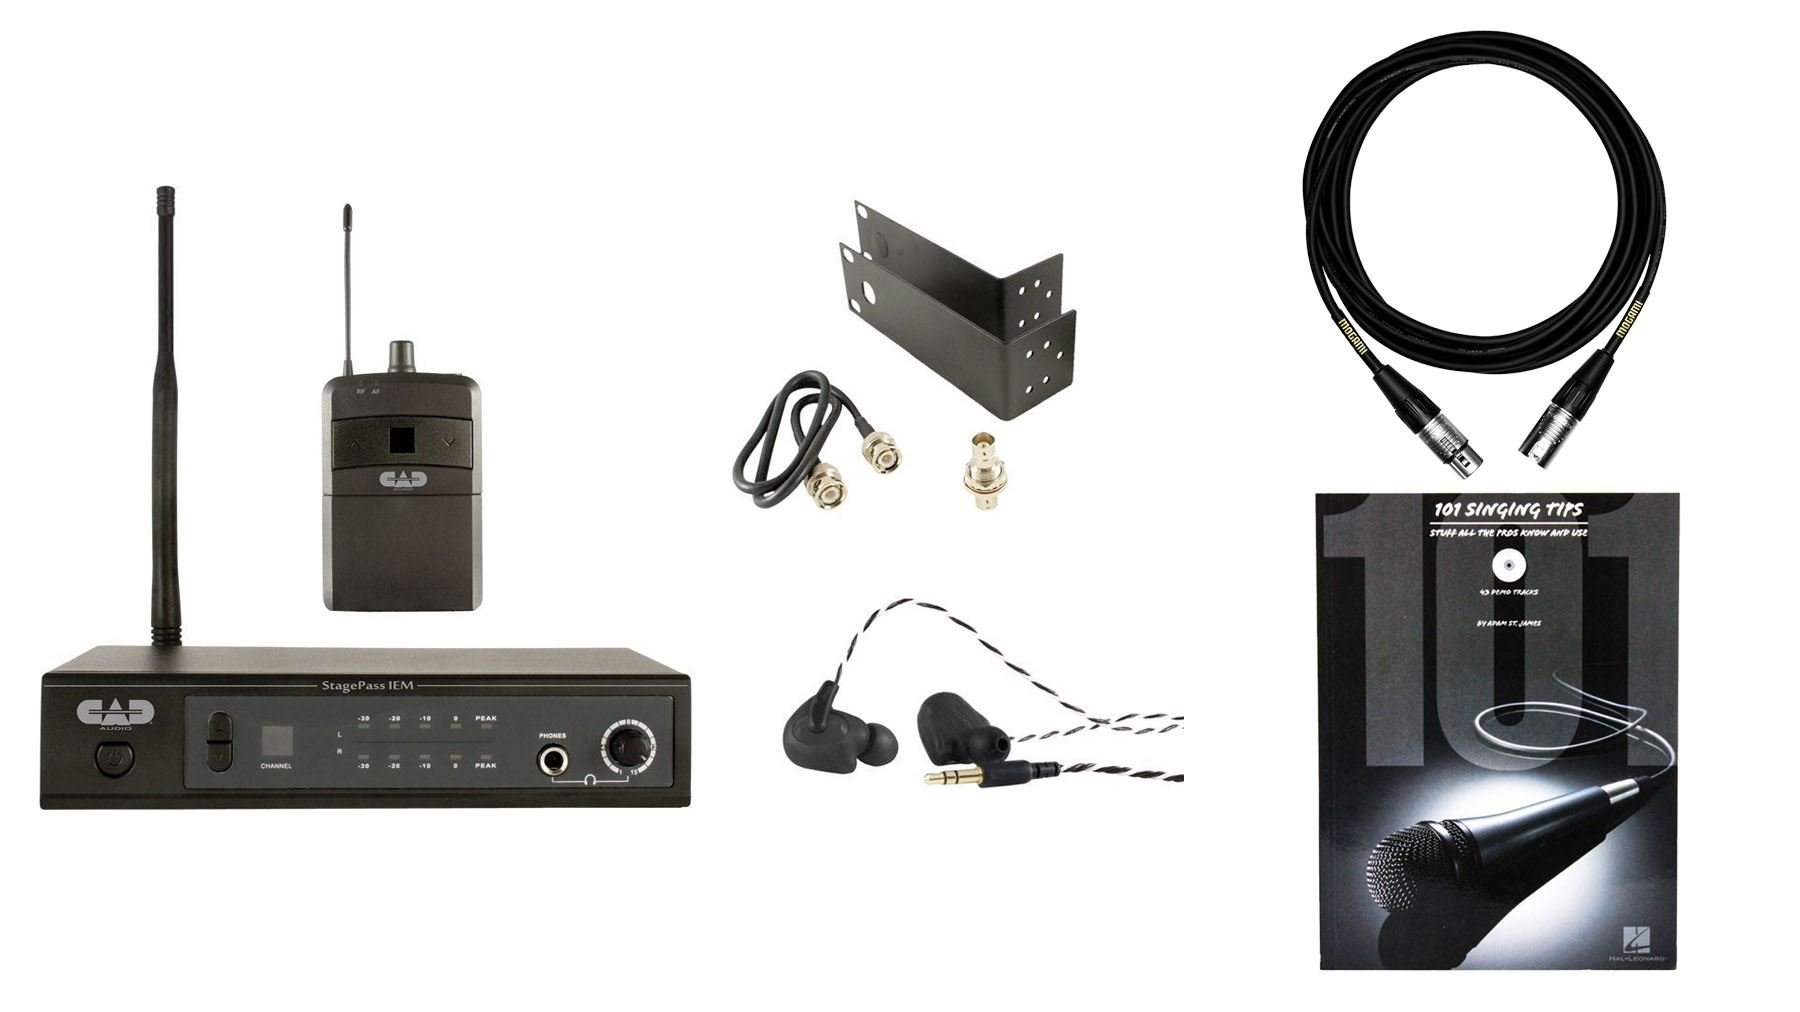 CAD Stagepass IEM w/ 101 Singing Tips & Mogami Premium XLR Cable Bundle